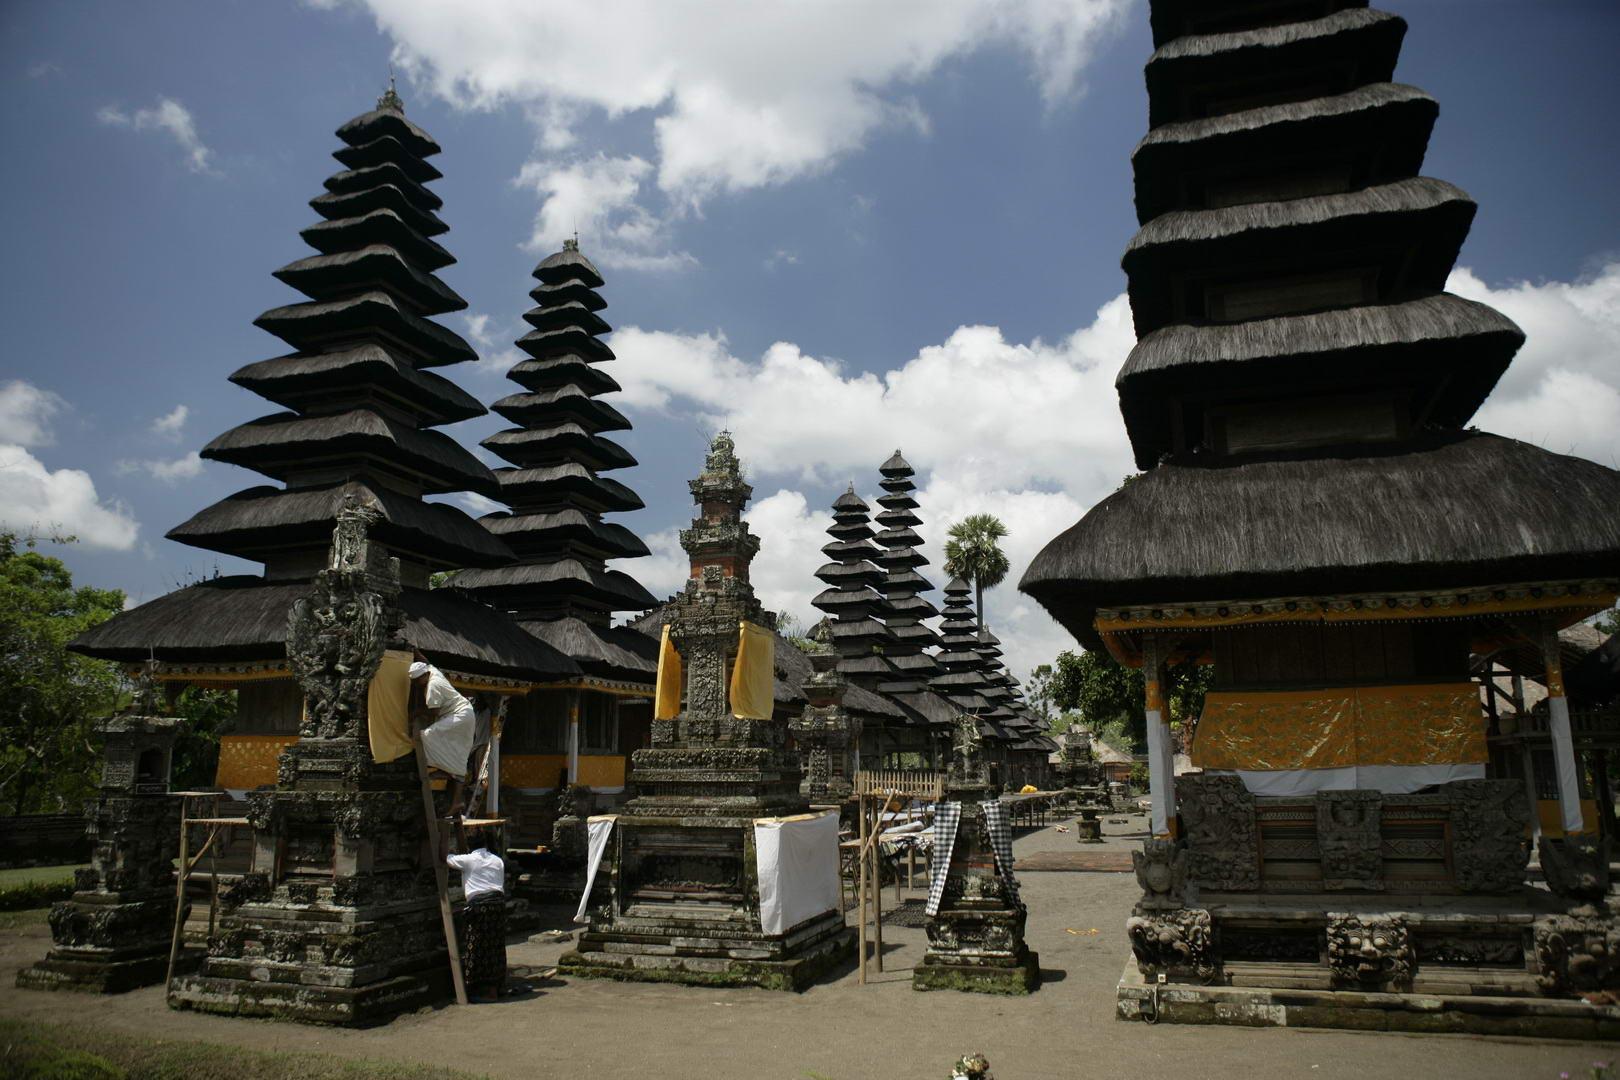 Eriks Bali 127